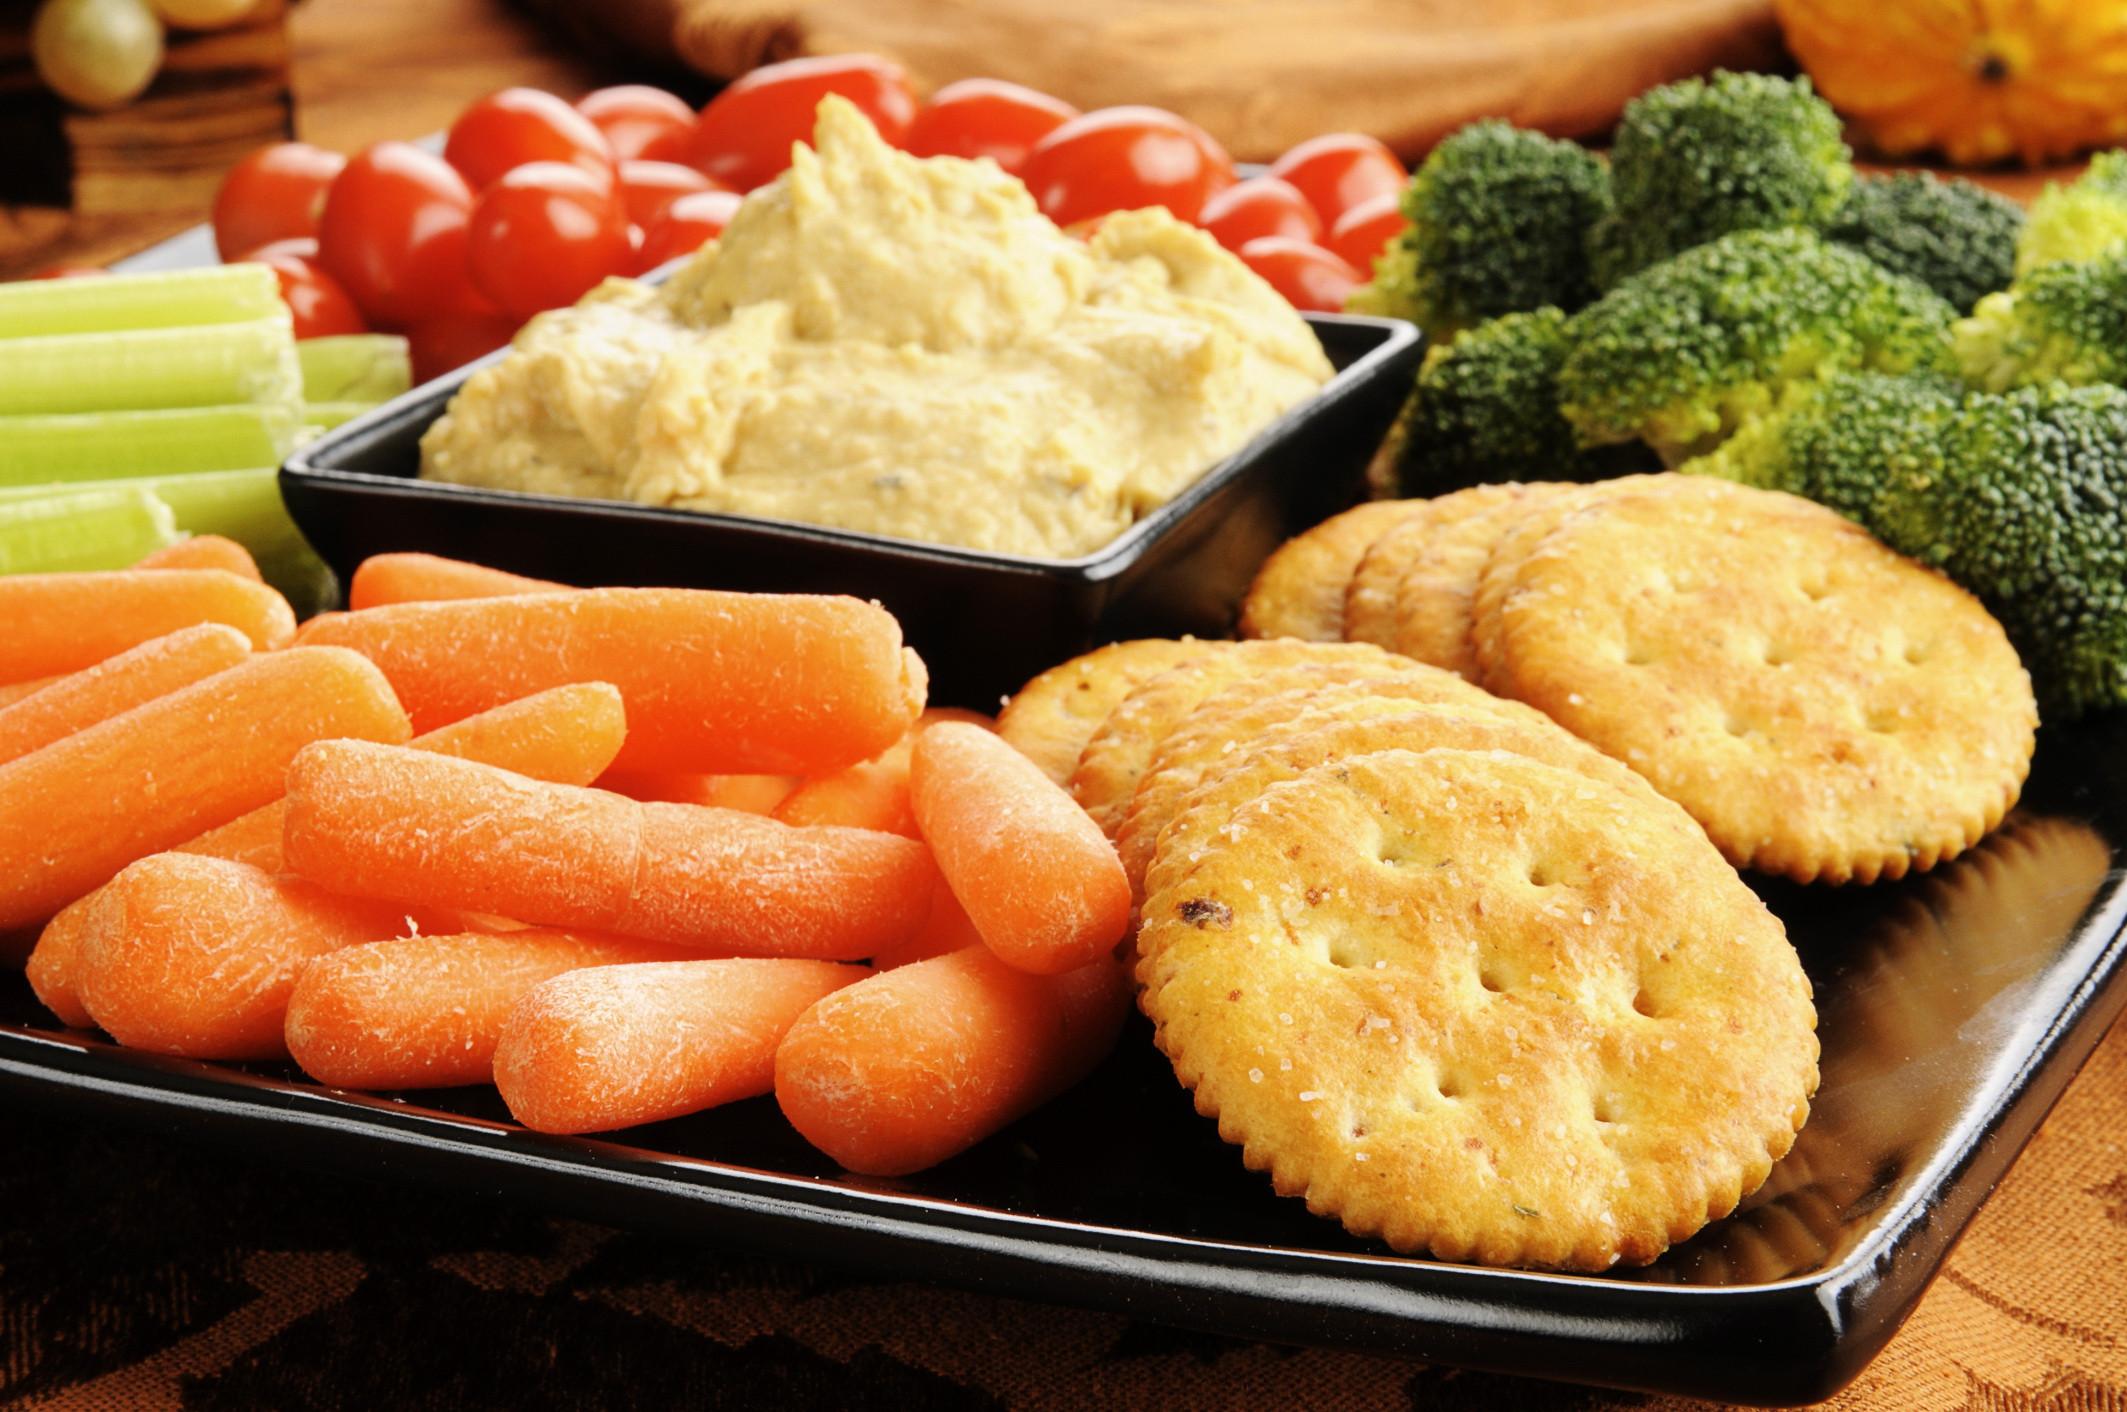 Healthy Vegetarian Snacks  100 Healthy Snacks – List Ve arian Food For Weight Loss